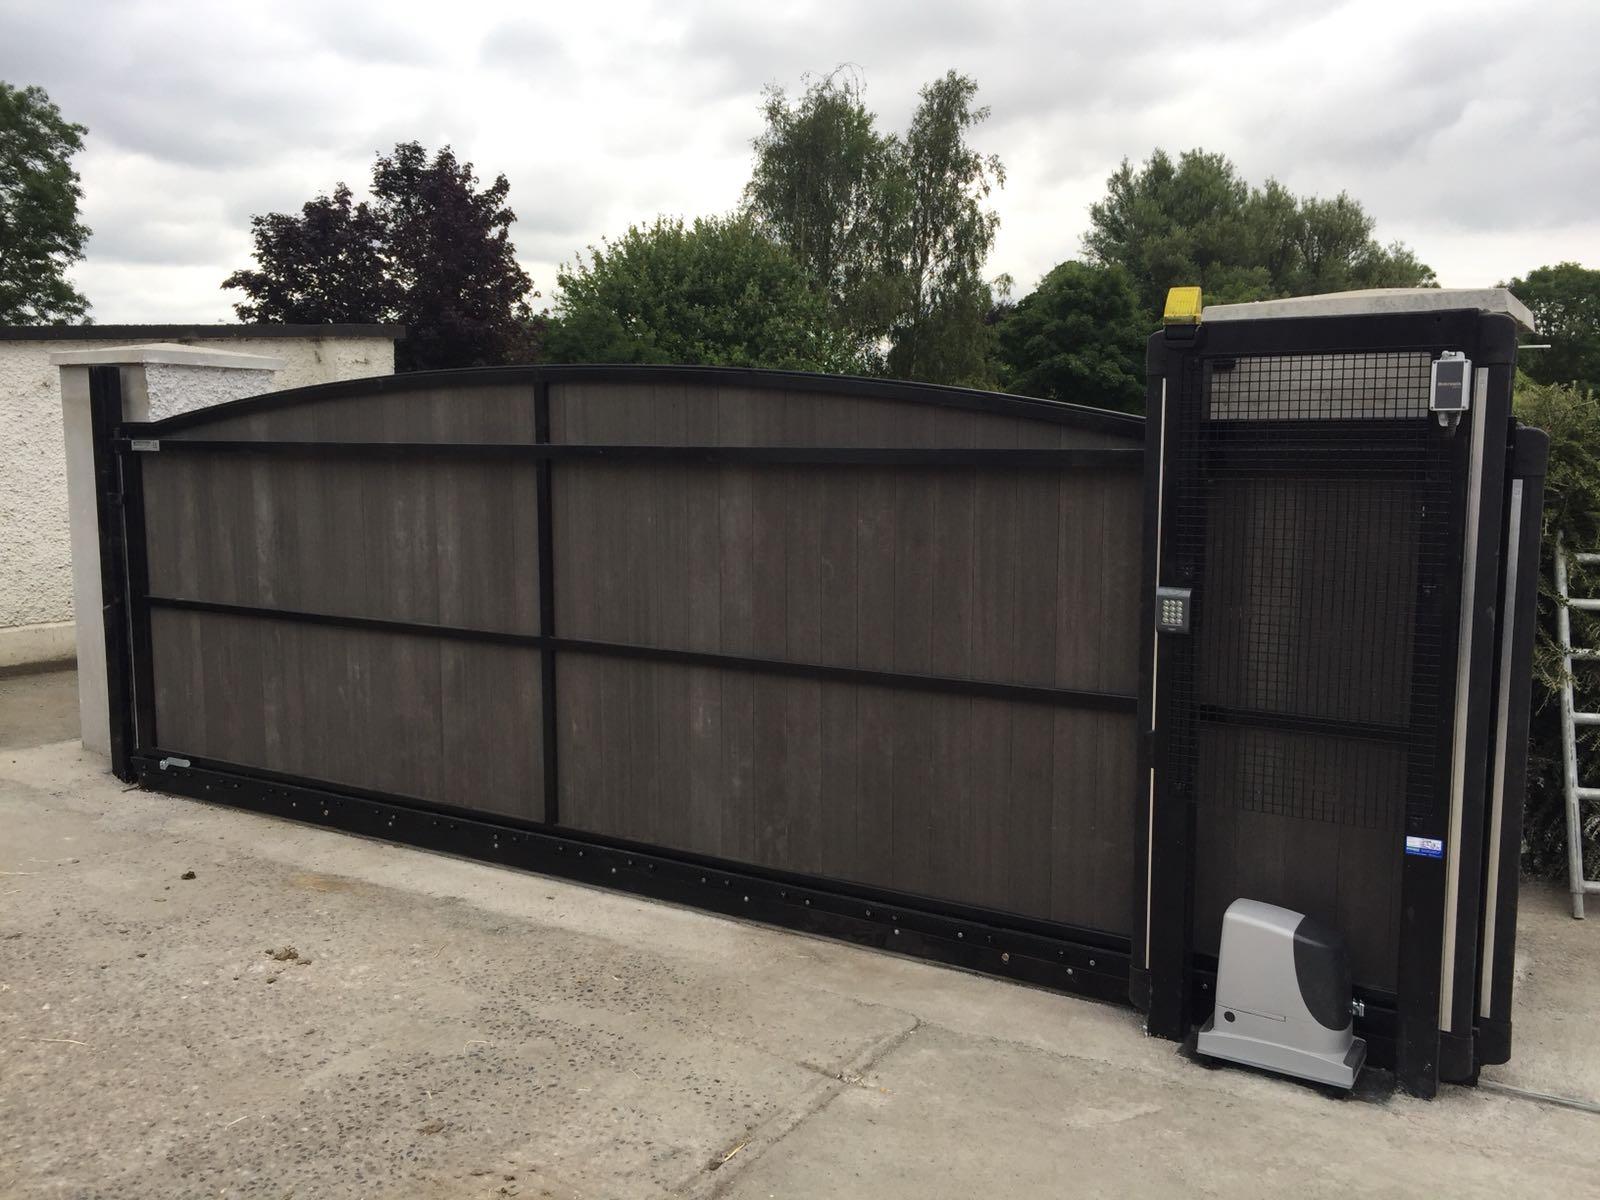 Irish Fencing Composite Fences And Gates Slider Gate